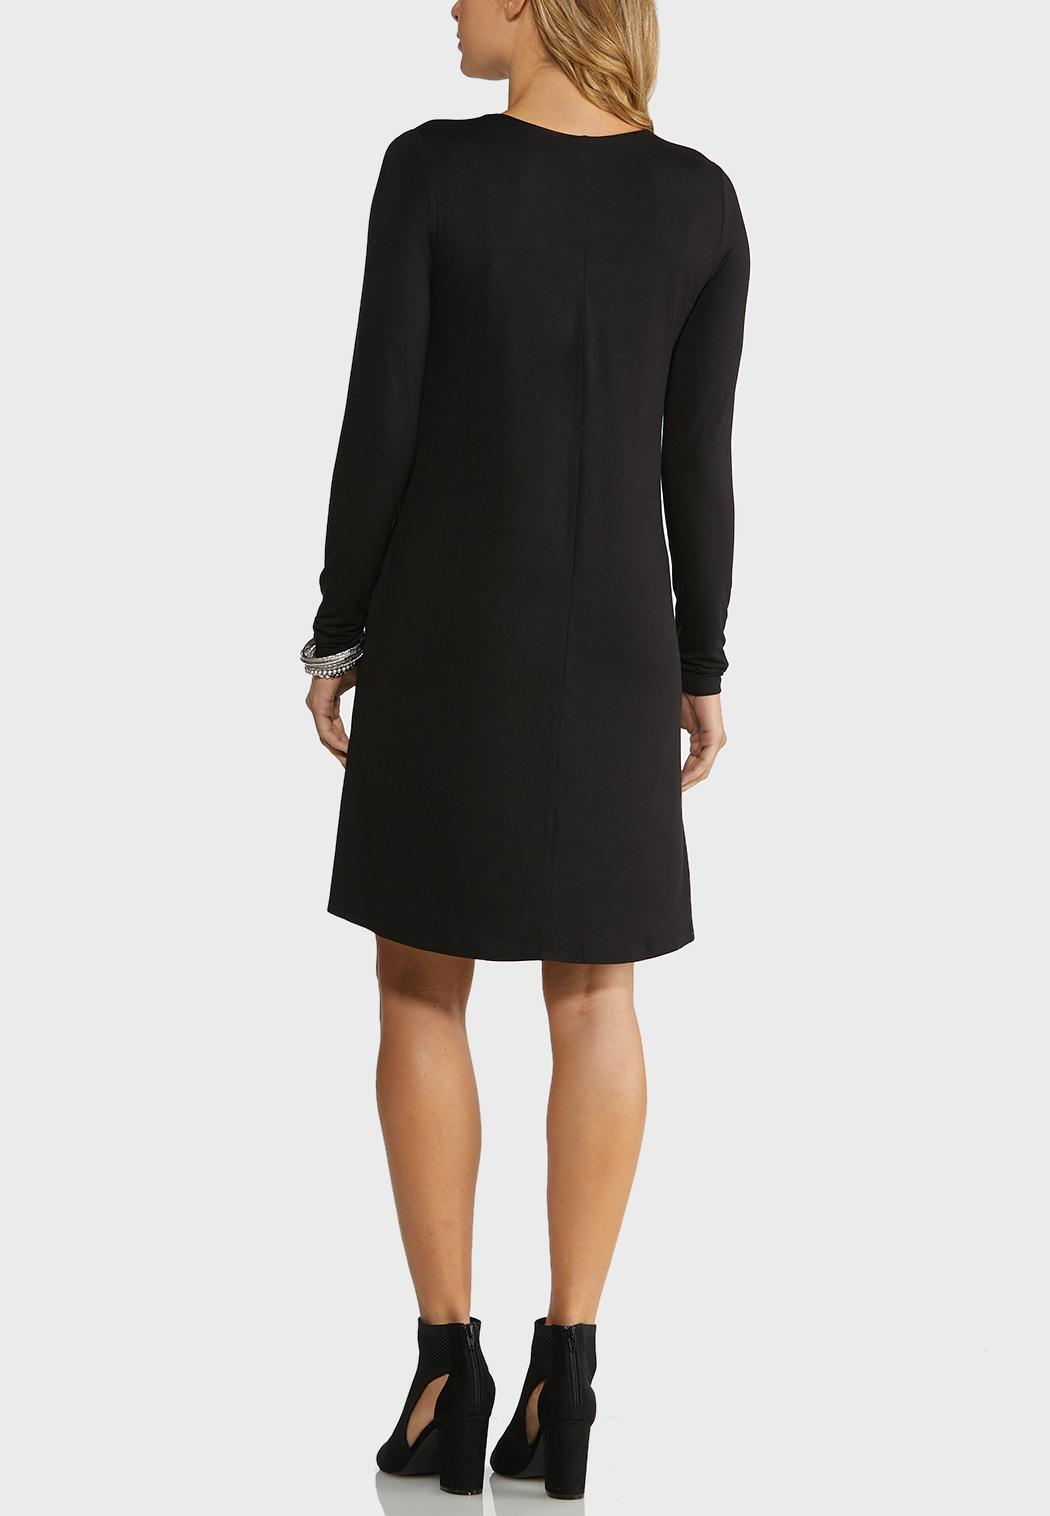 Comfy Solid Swing Dress (Item #43979103)